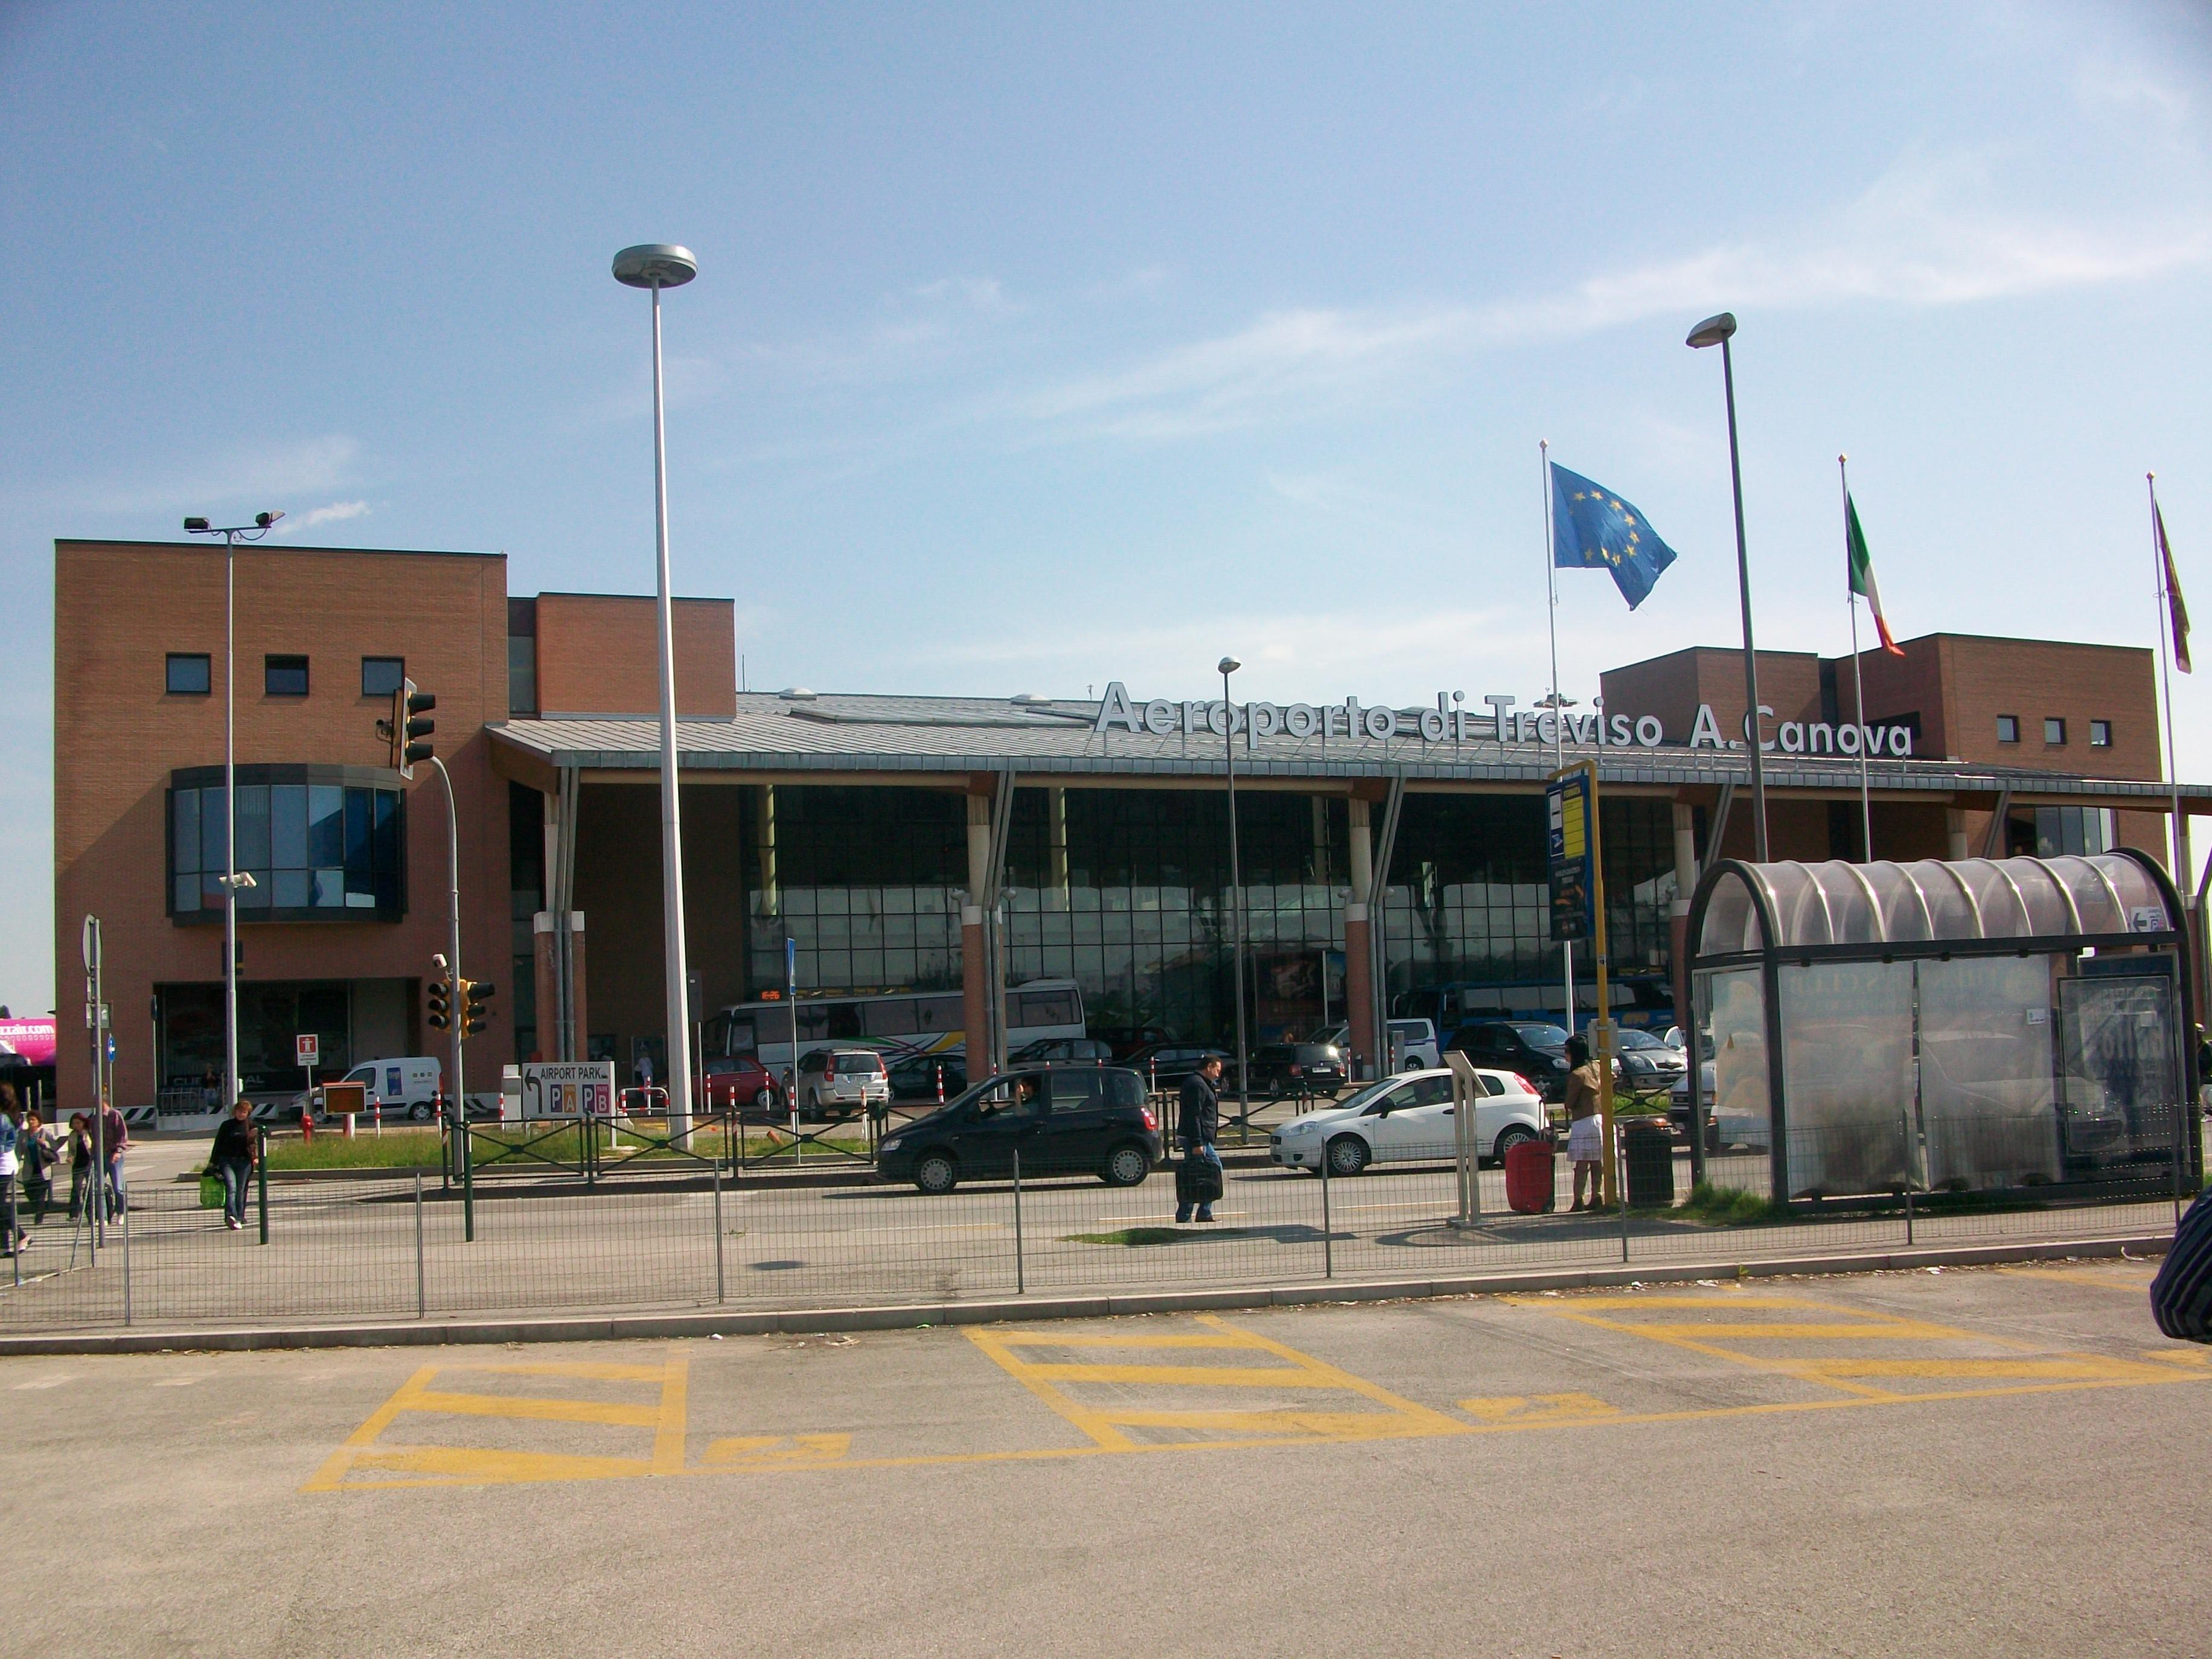 Sala Fumatori Aeroporto Palermo : Aeroporto di treviso sant angelo wikipedia